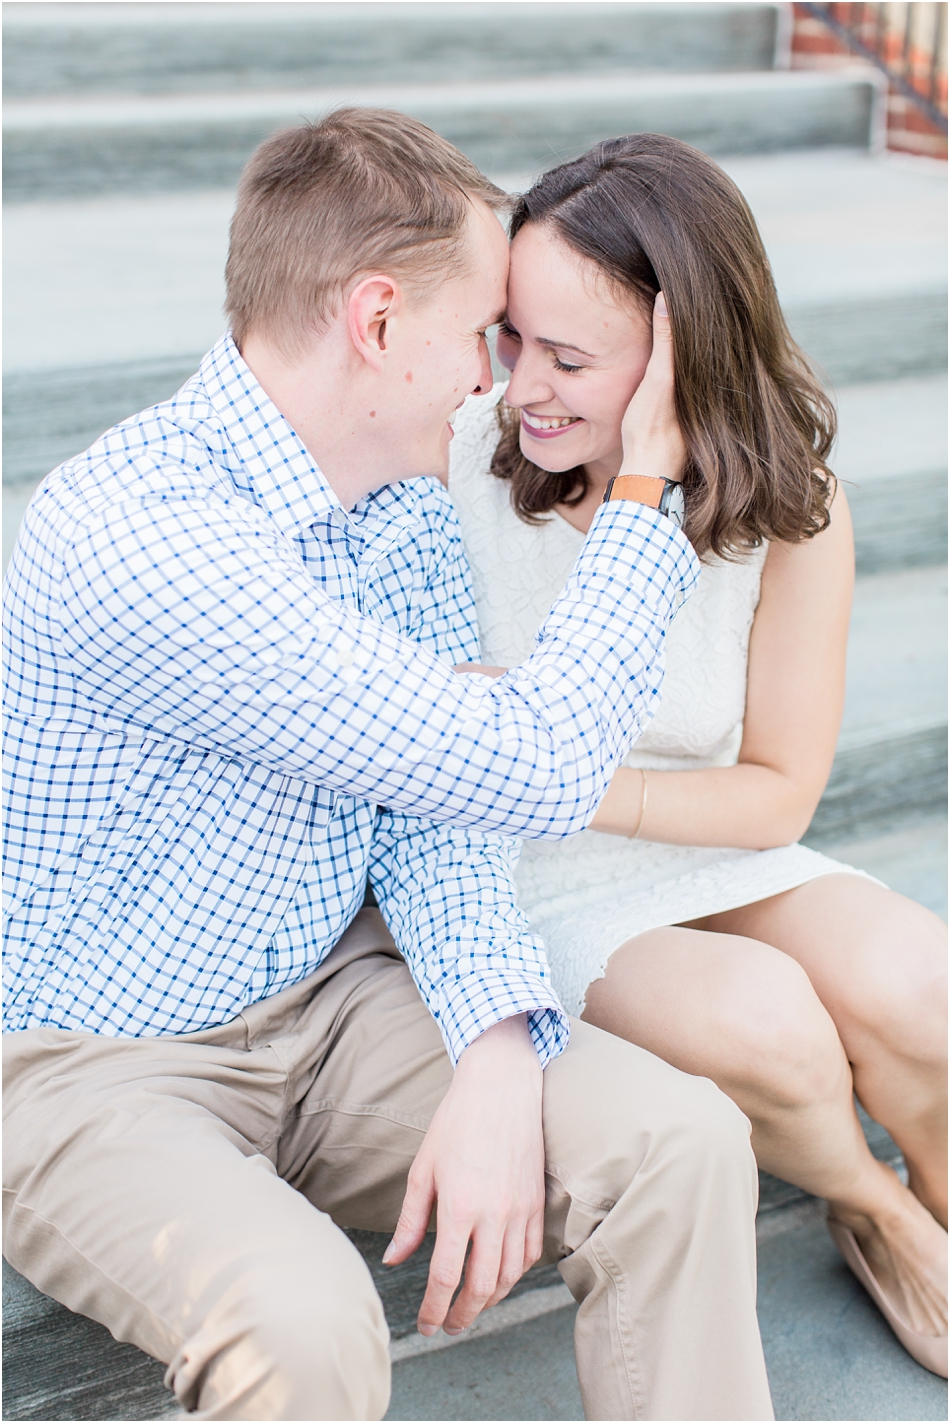 arnold_arboretum_engagement_dylan_mariana_cape_cod_boston_new_england_wedding_photographer_Meredith_Jane_Photography_photo_2656.jpg